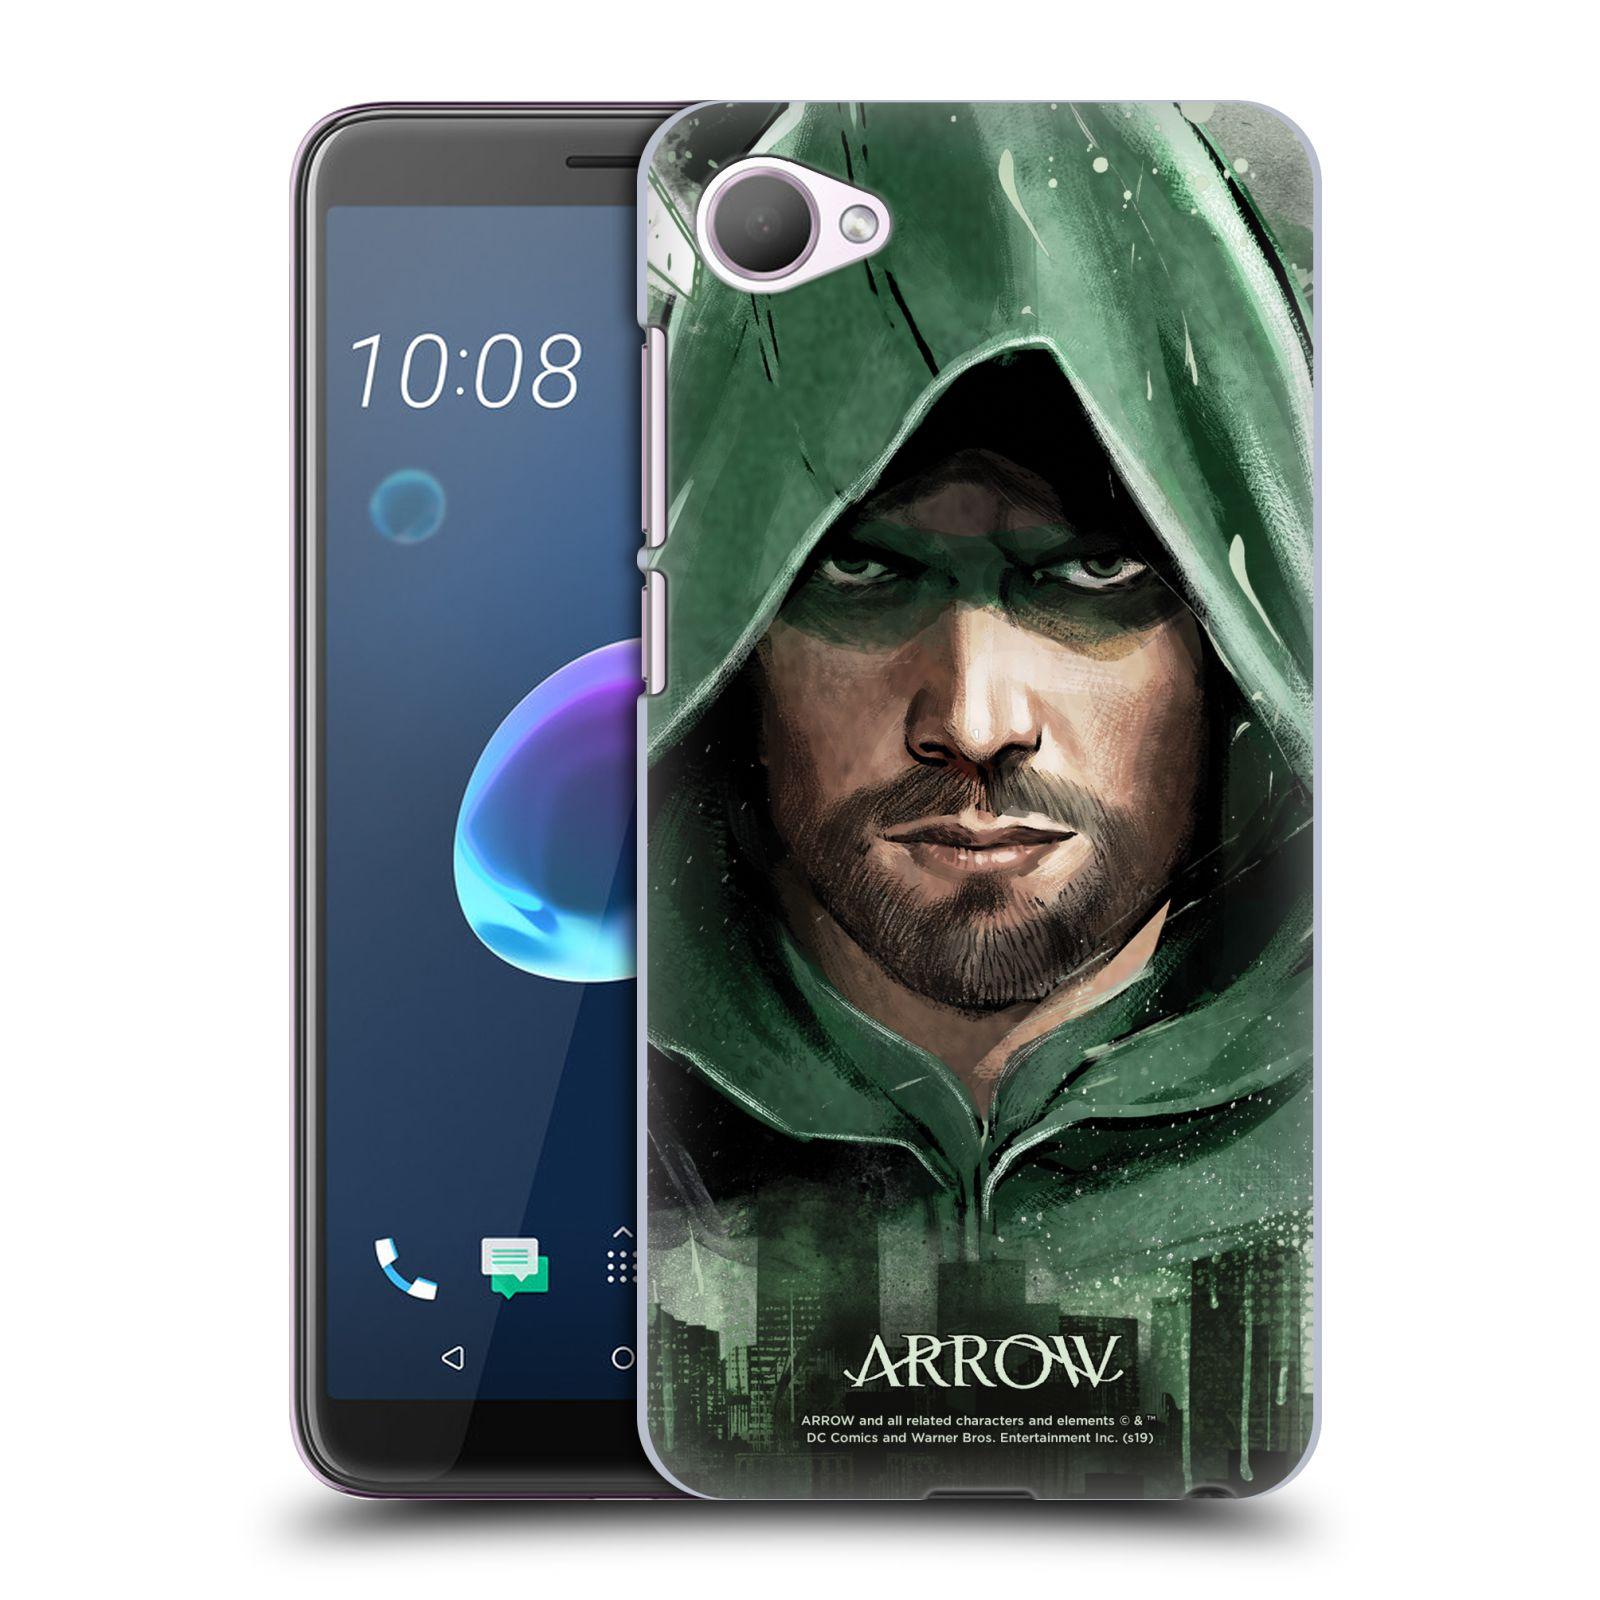 Pouzdro na mobil HTC Desire 12 / Desire 12 DUAL SIM - HEAD CASE - Seriál Arrow - kreslený motiv